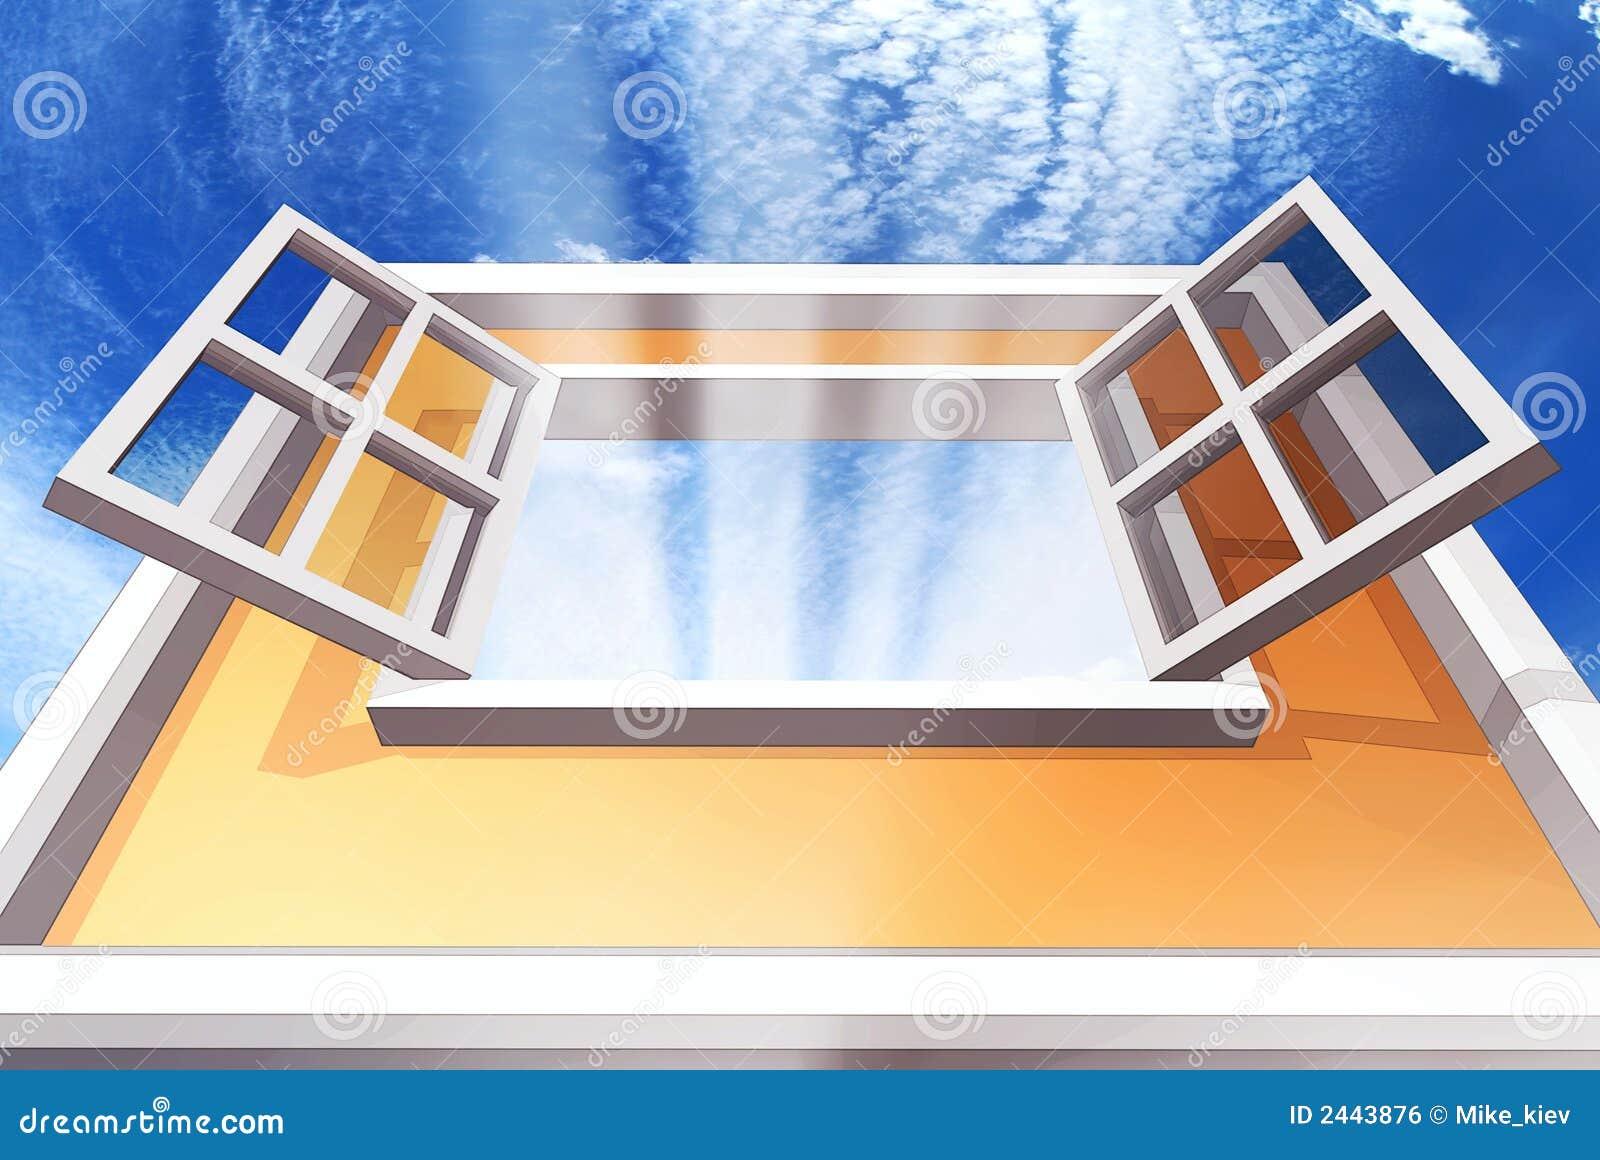 ge ffnetes fenster lizenzfreies stockbild bild 2443876. Black Bedroom Furniture Sets. Home Design Ideas